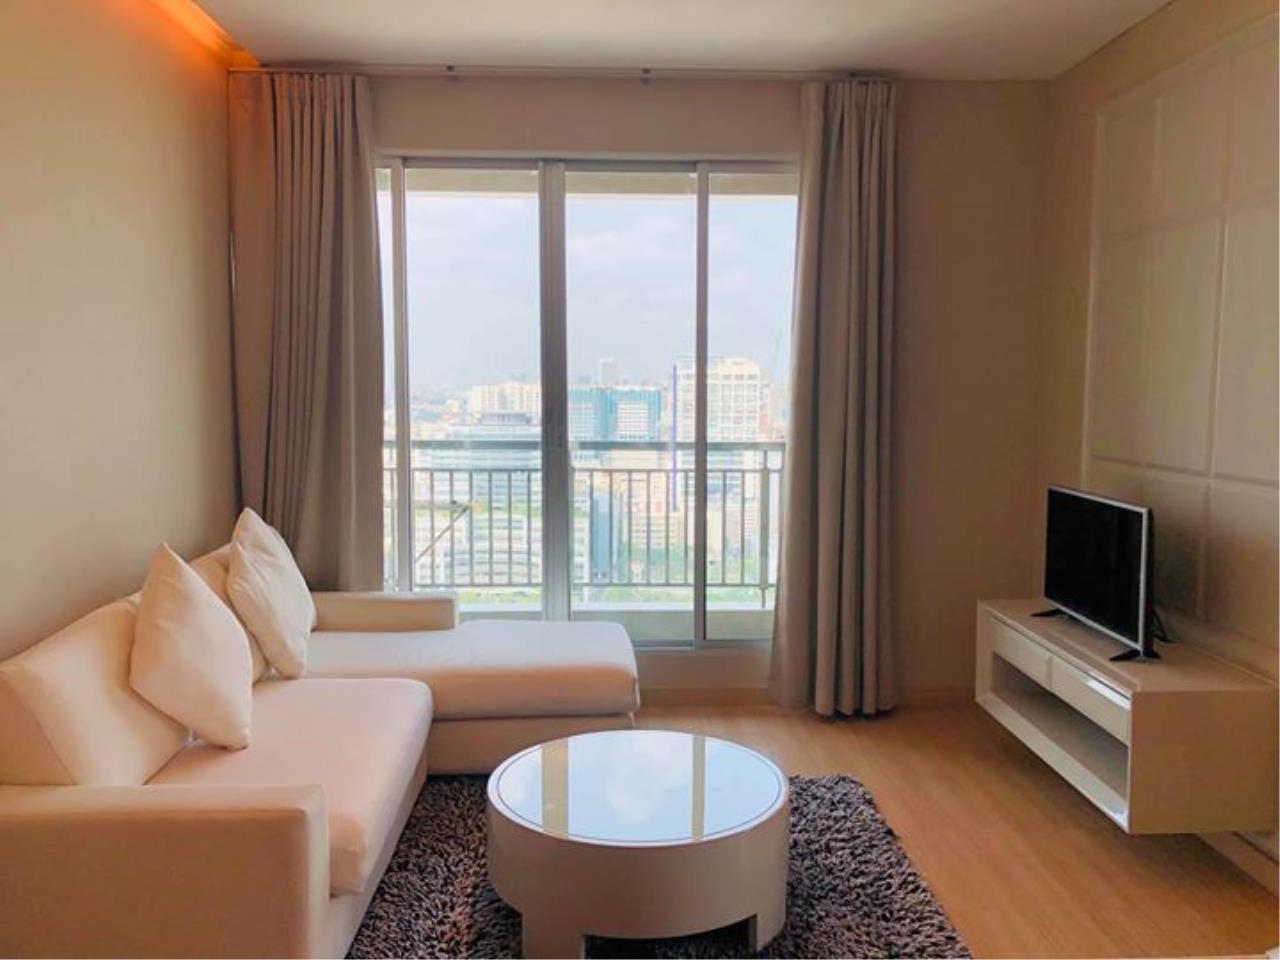 Century21 Skylux Agency's The Address Phayathai / Condo For Sale / 1 Bedroom / 51.5 SQM / BTS Phaya Thai / Bangkok 1